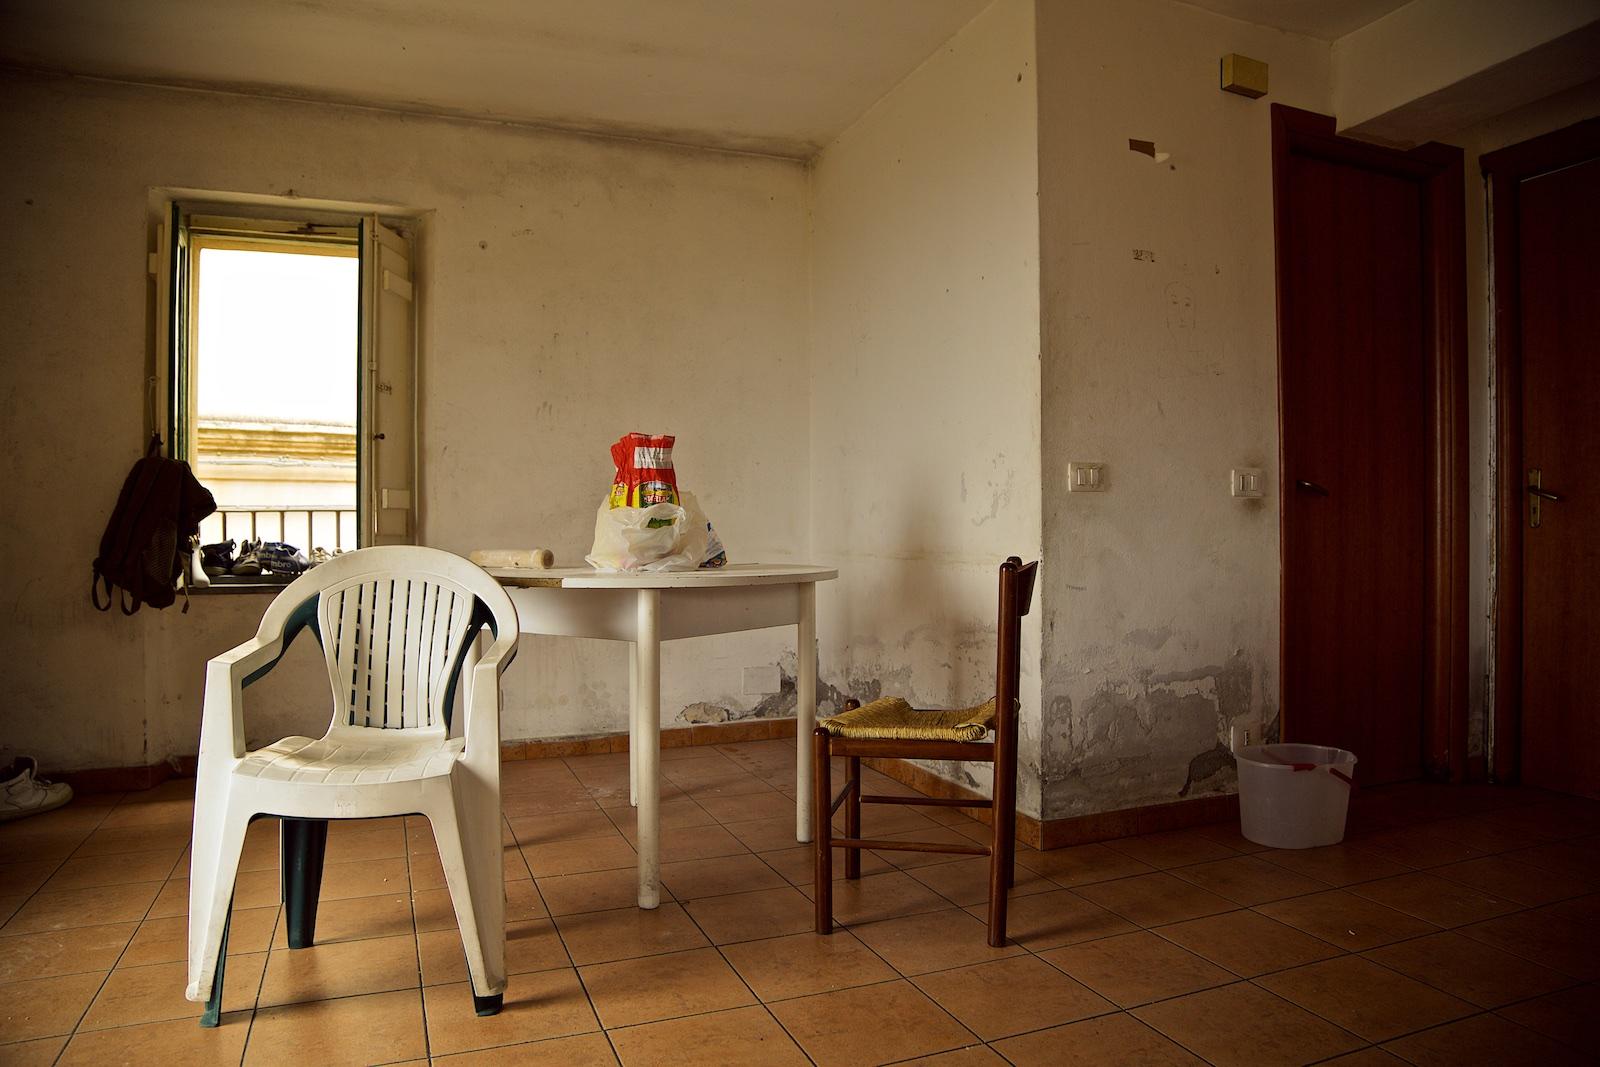 permanently-temporary-refugees-italy-rifugiati-italia-denis-bosnic-photography-portraits-8+(1).jpg